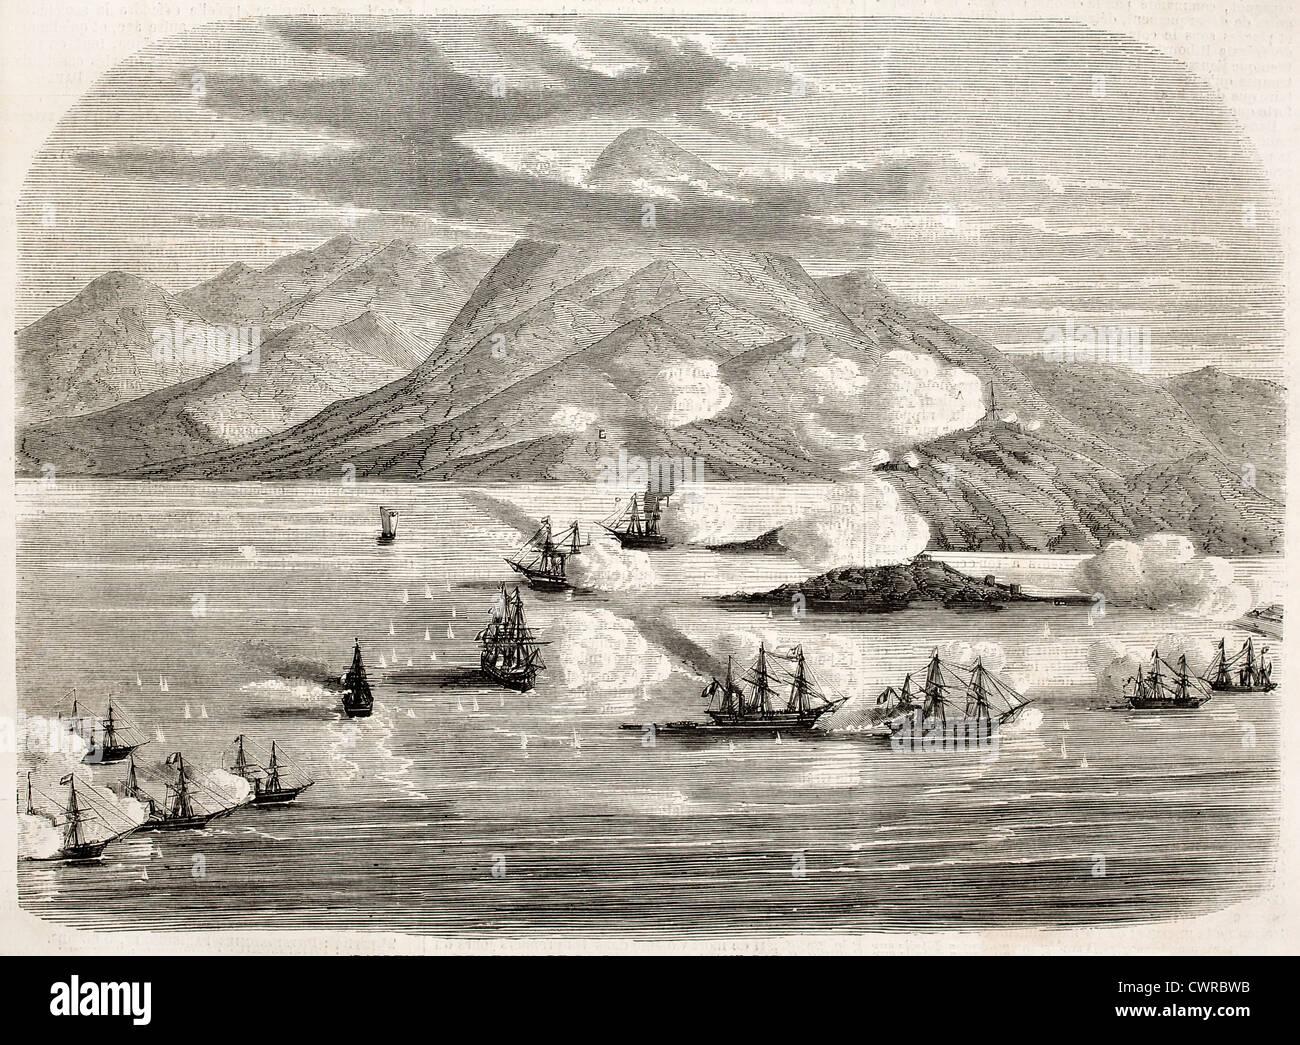 Tourane Bay (heute Da Nang) Bombardierung durch französische Flotte Stockbild